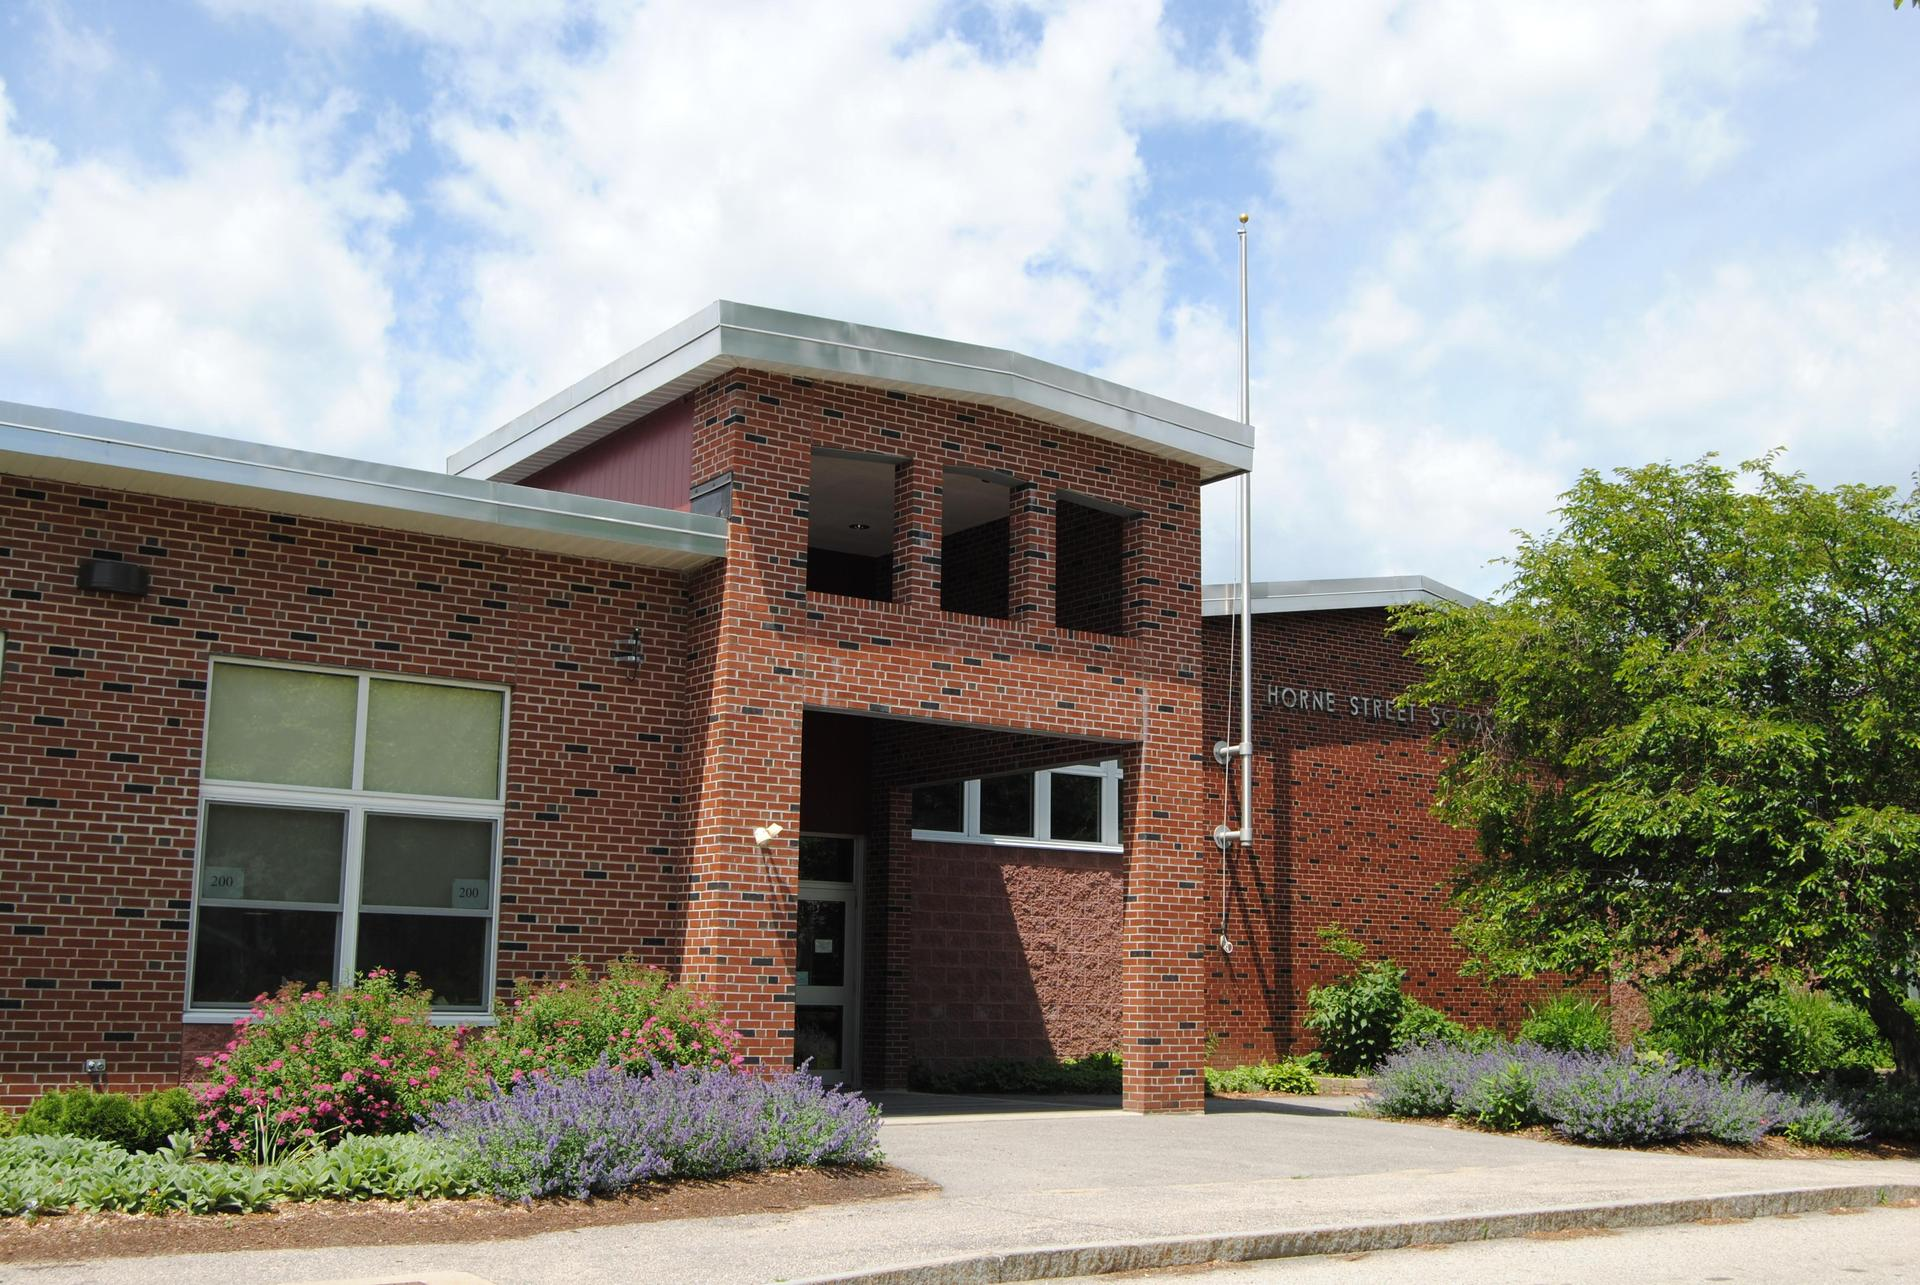 Horne Street School